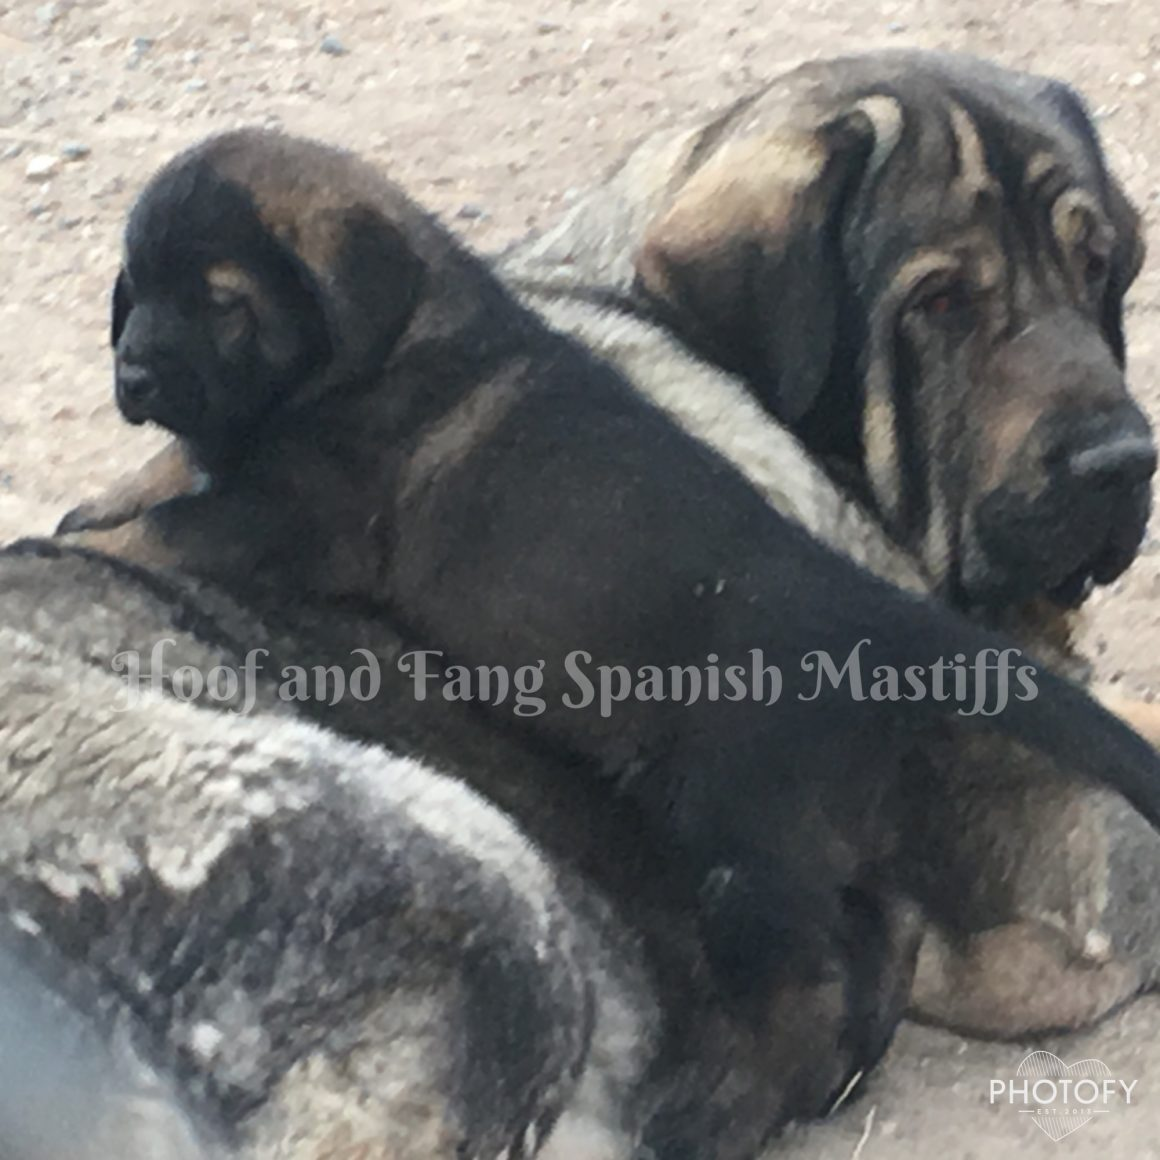 Hoof And Fang Spanish Mastiffs Purebred Spanish Mastiffs From